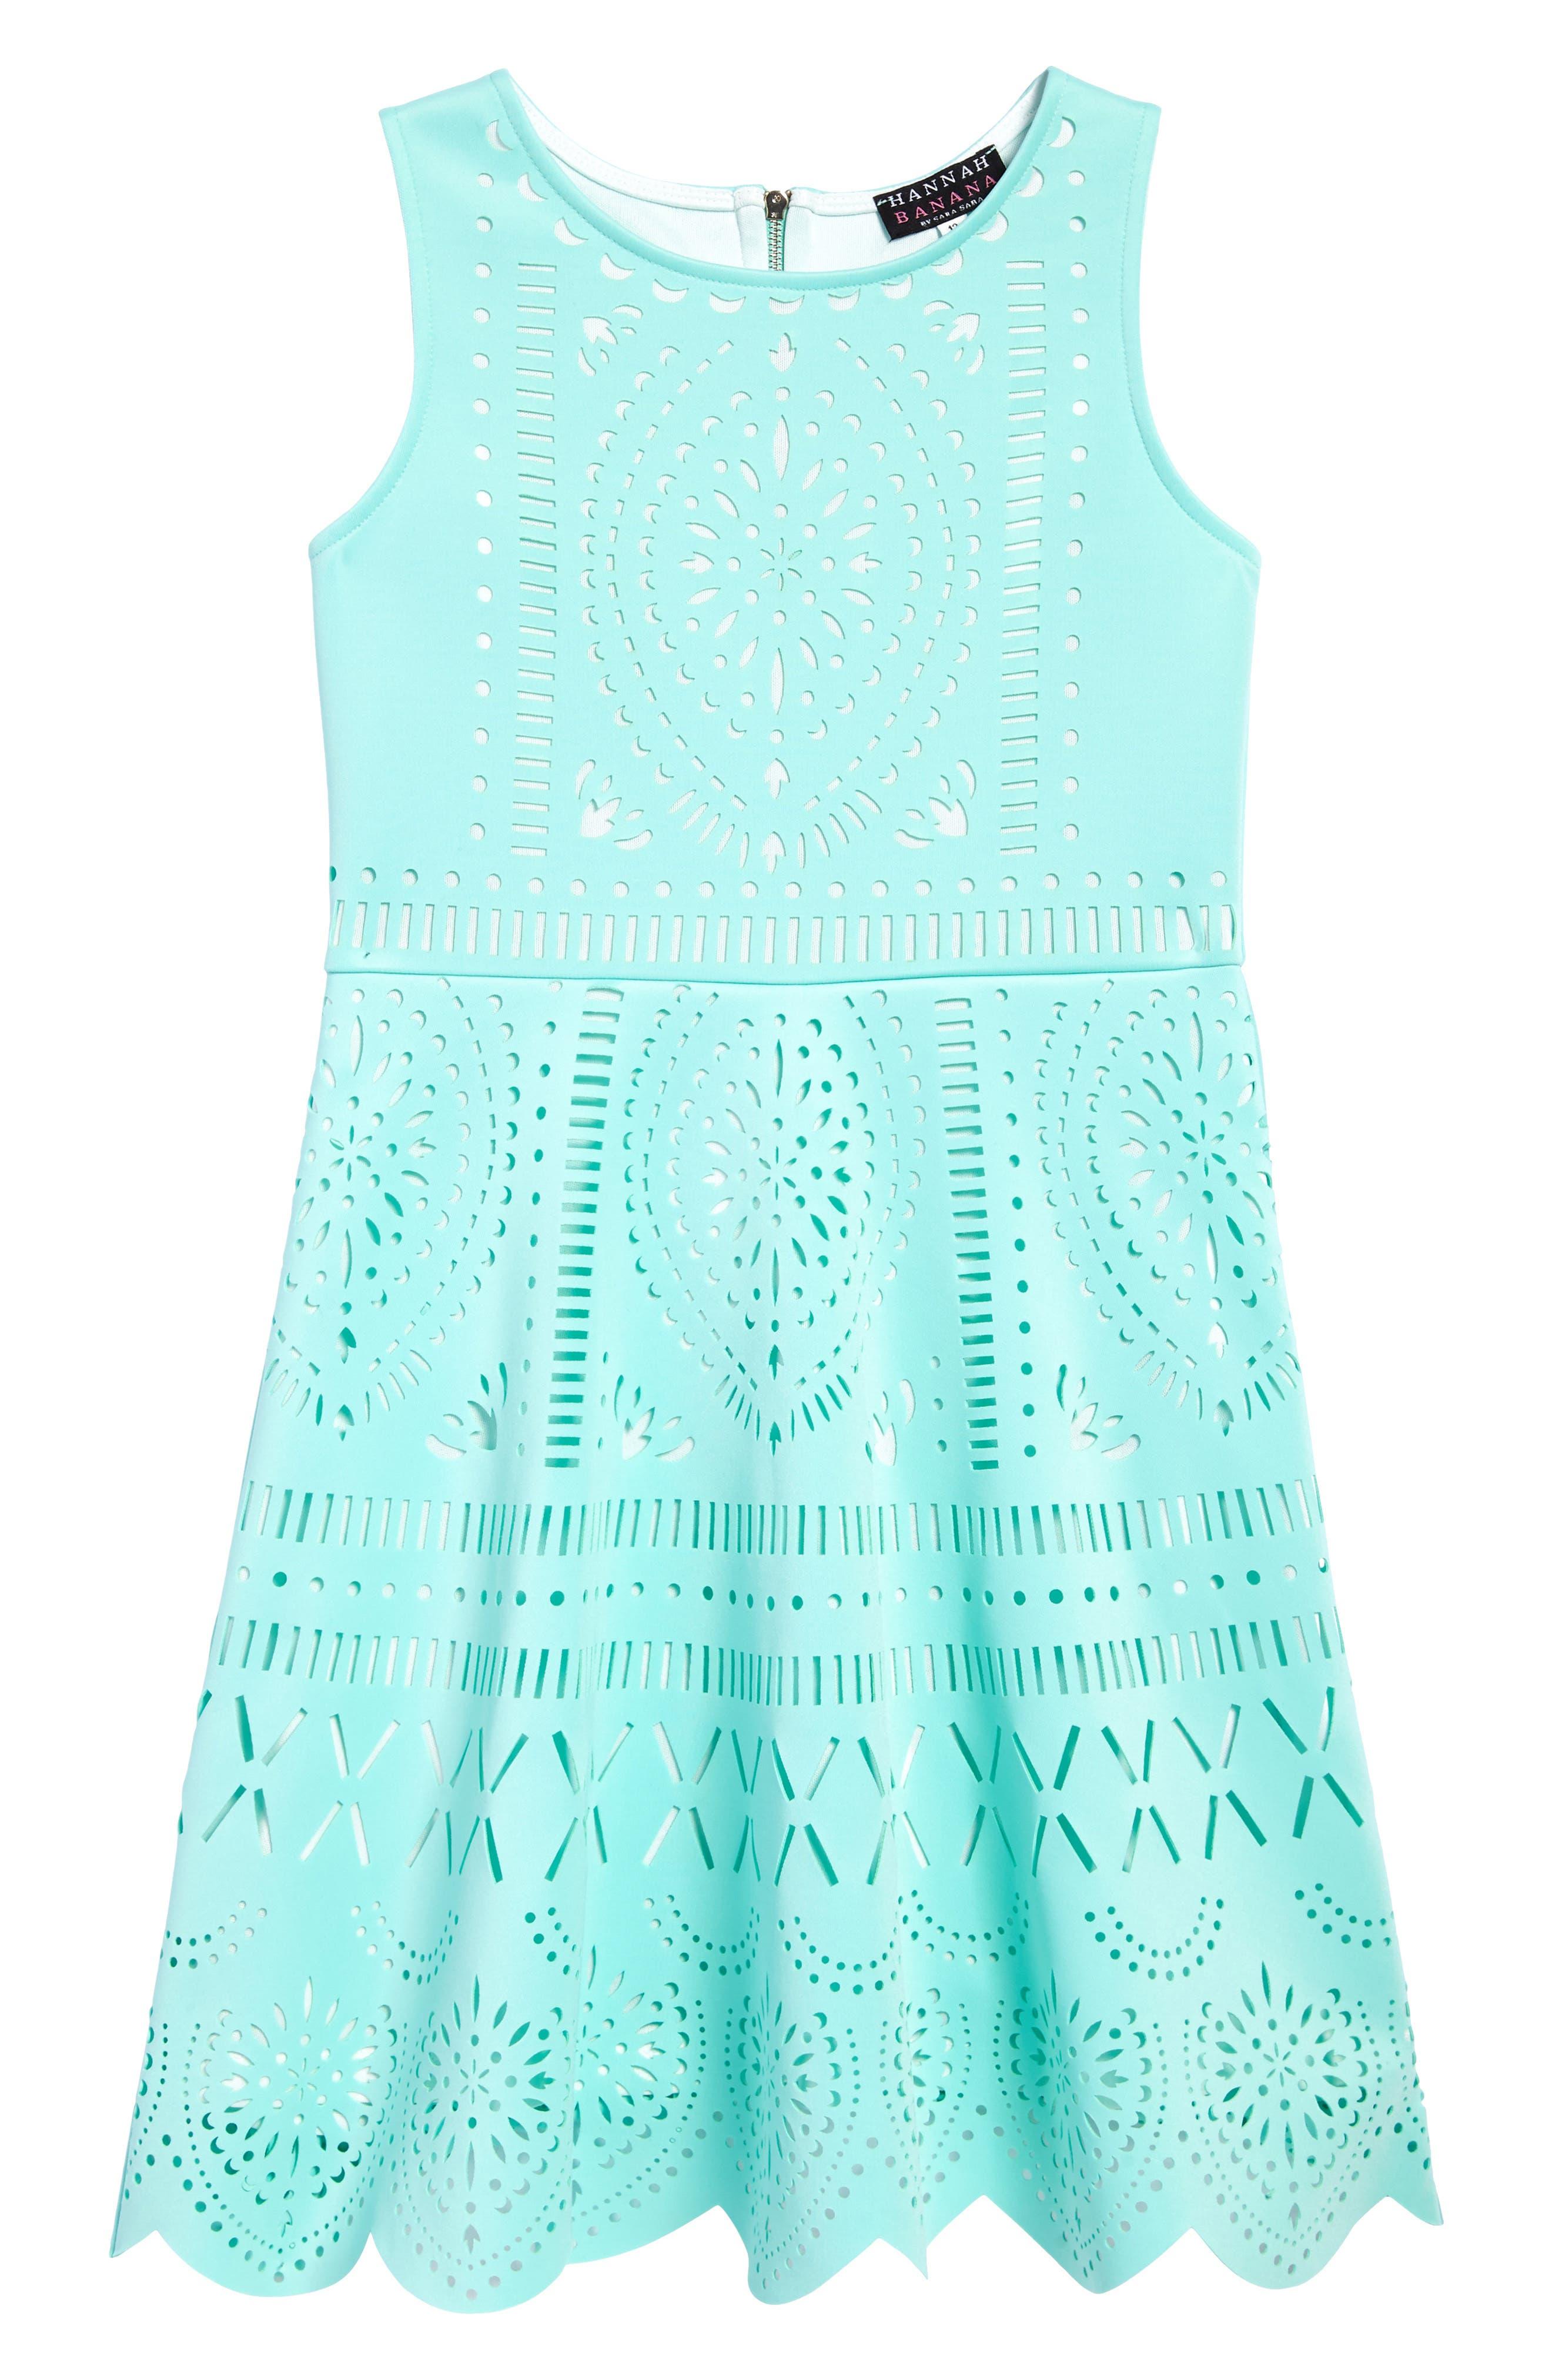 HANNAH BANANA Laser Cut Fit & Flare Dress, Main, color, 440